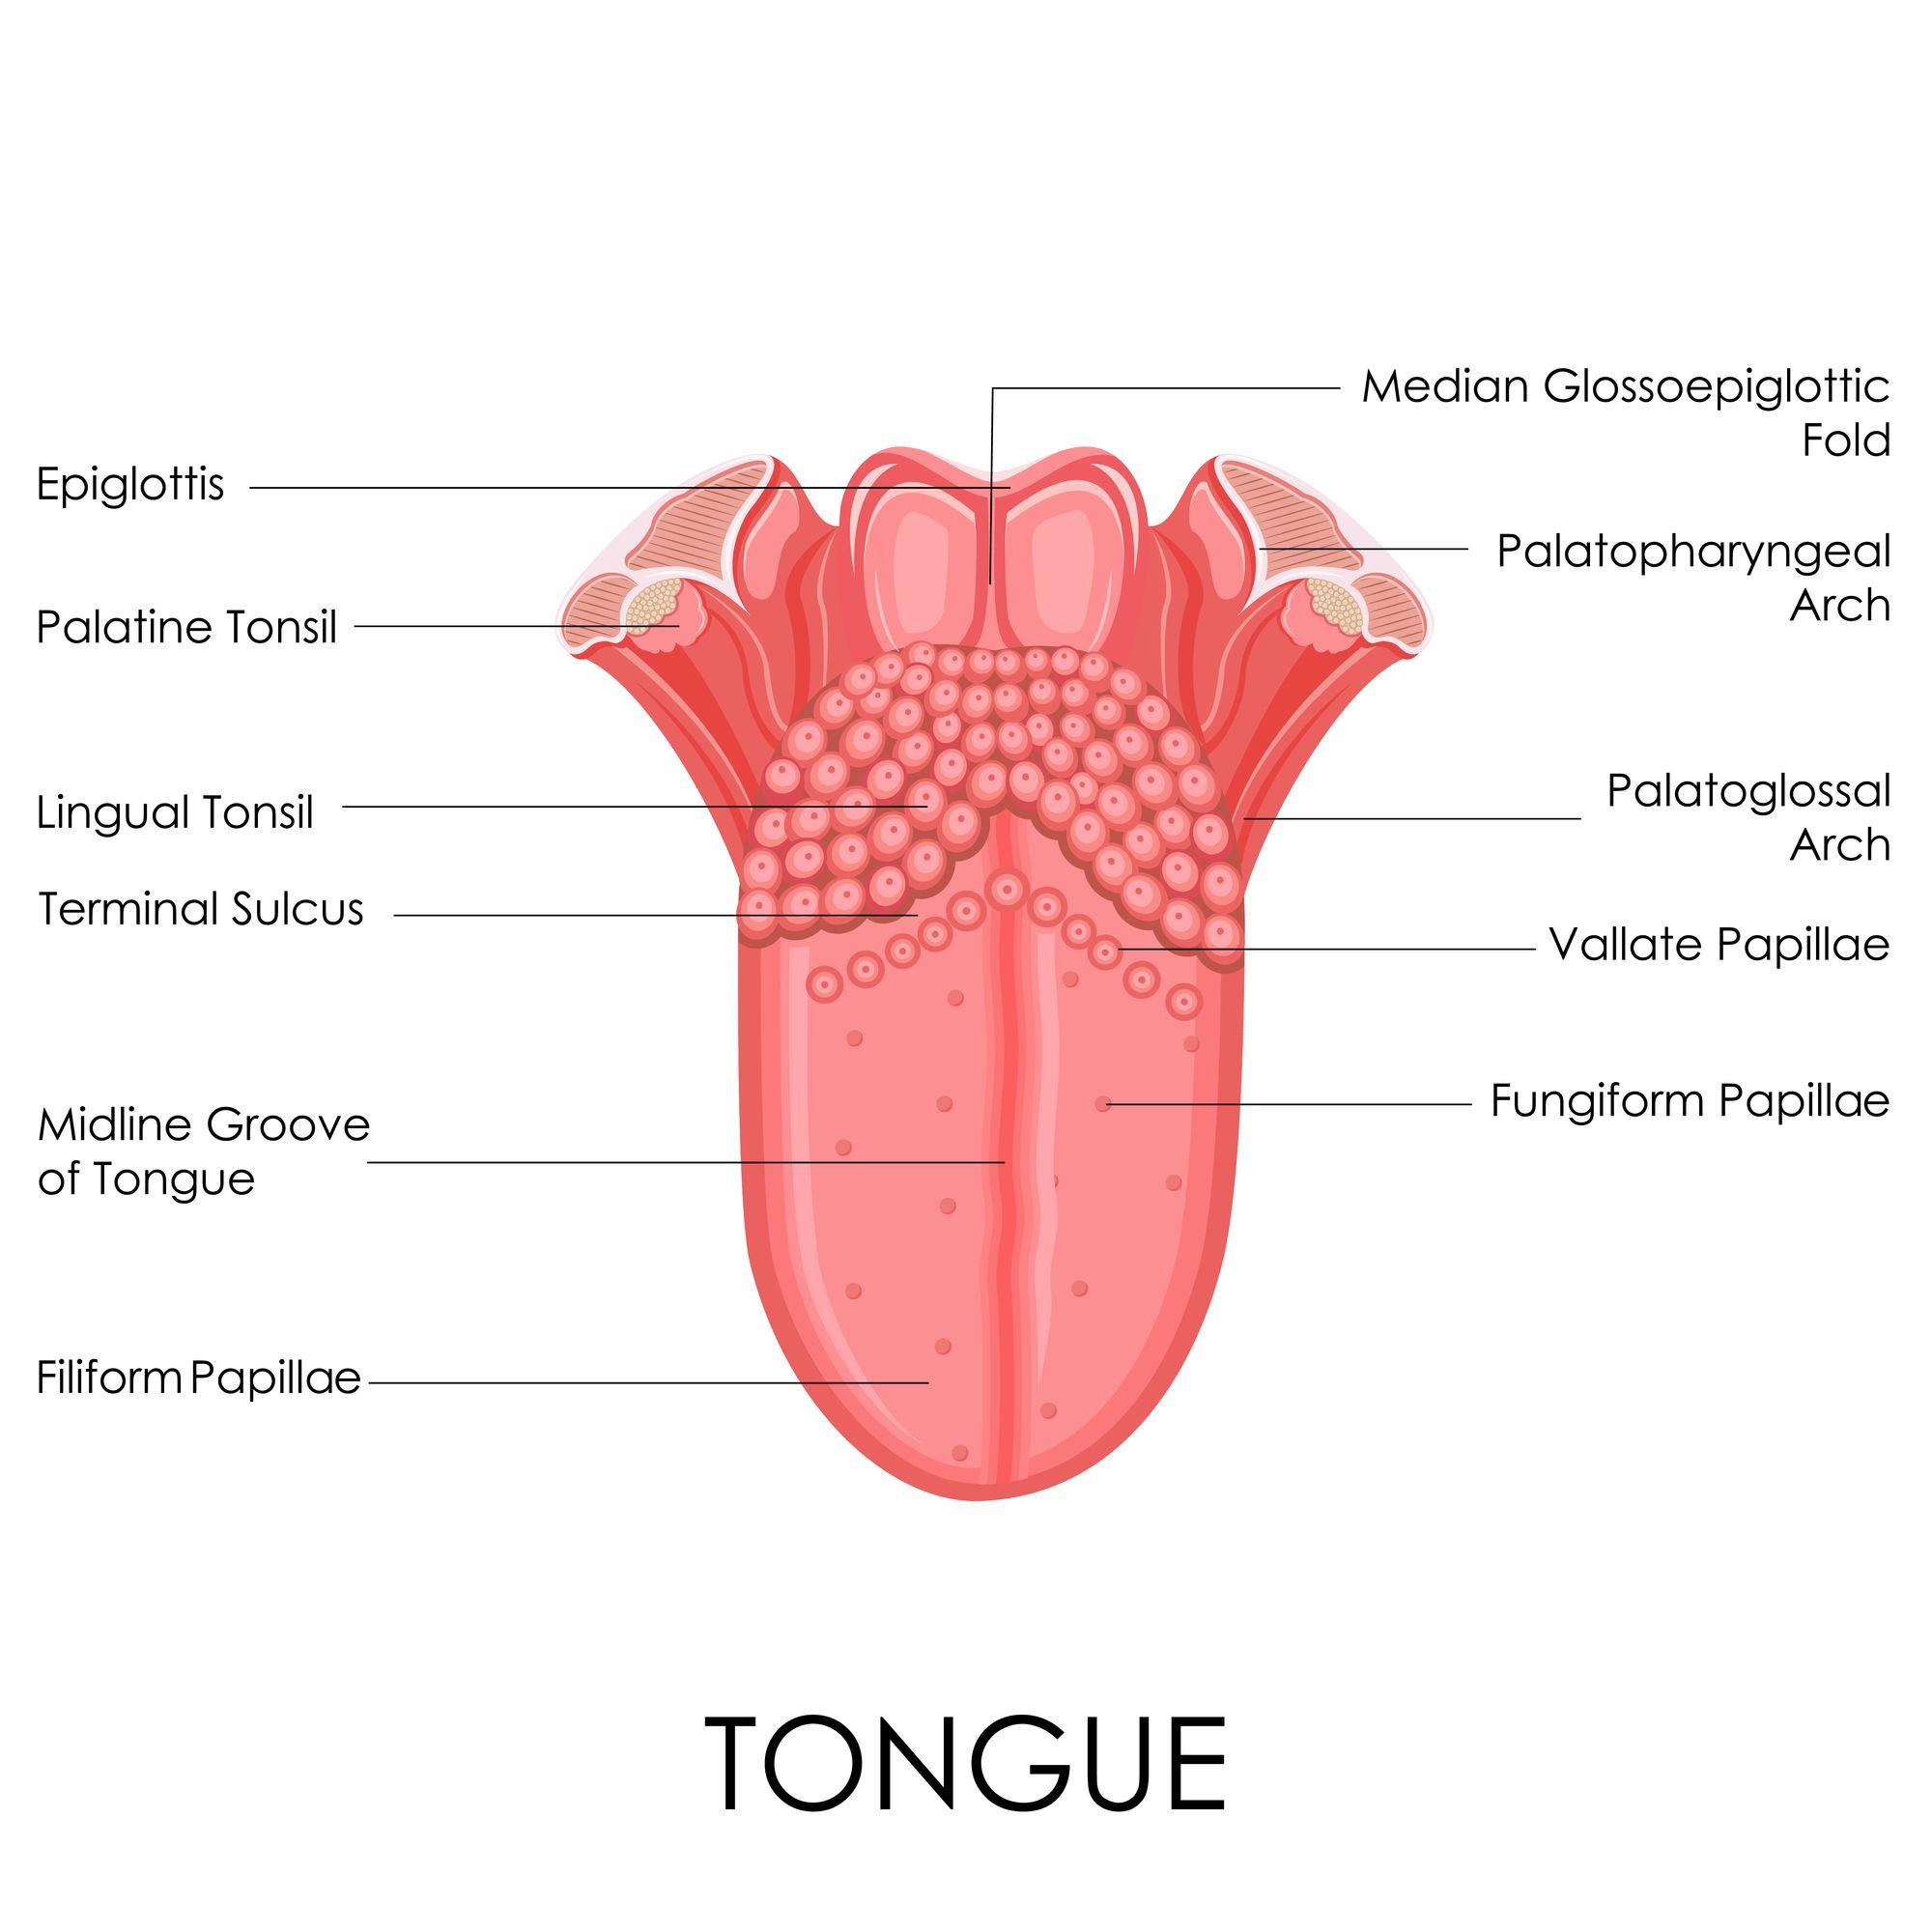 Human Tongue Anatomy | Anatomy | Pinterest | Human tongue and Anatomy